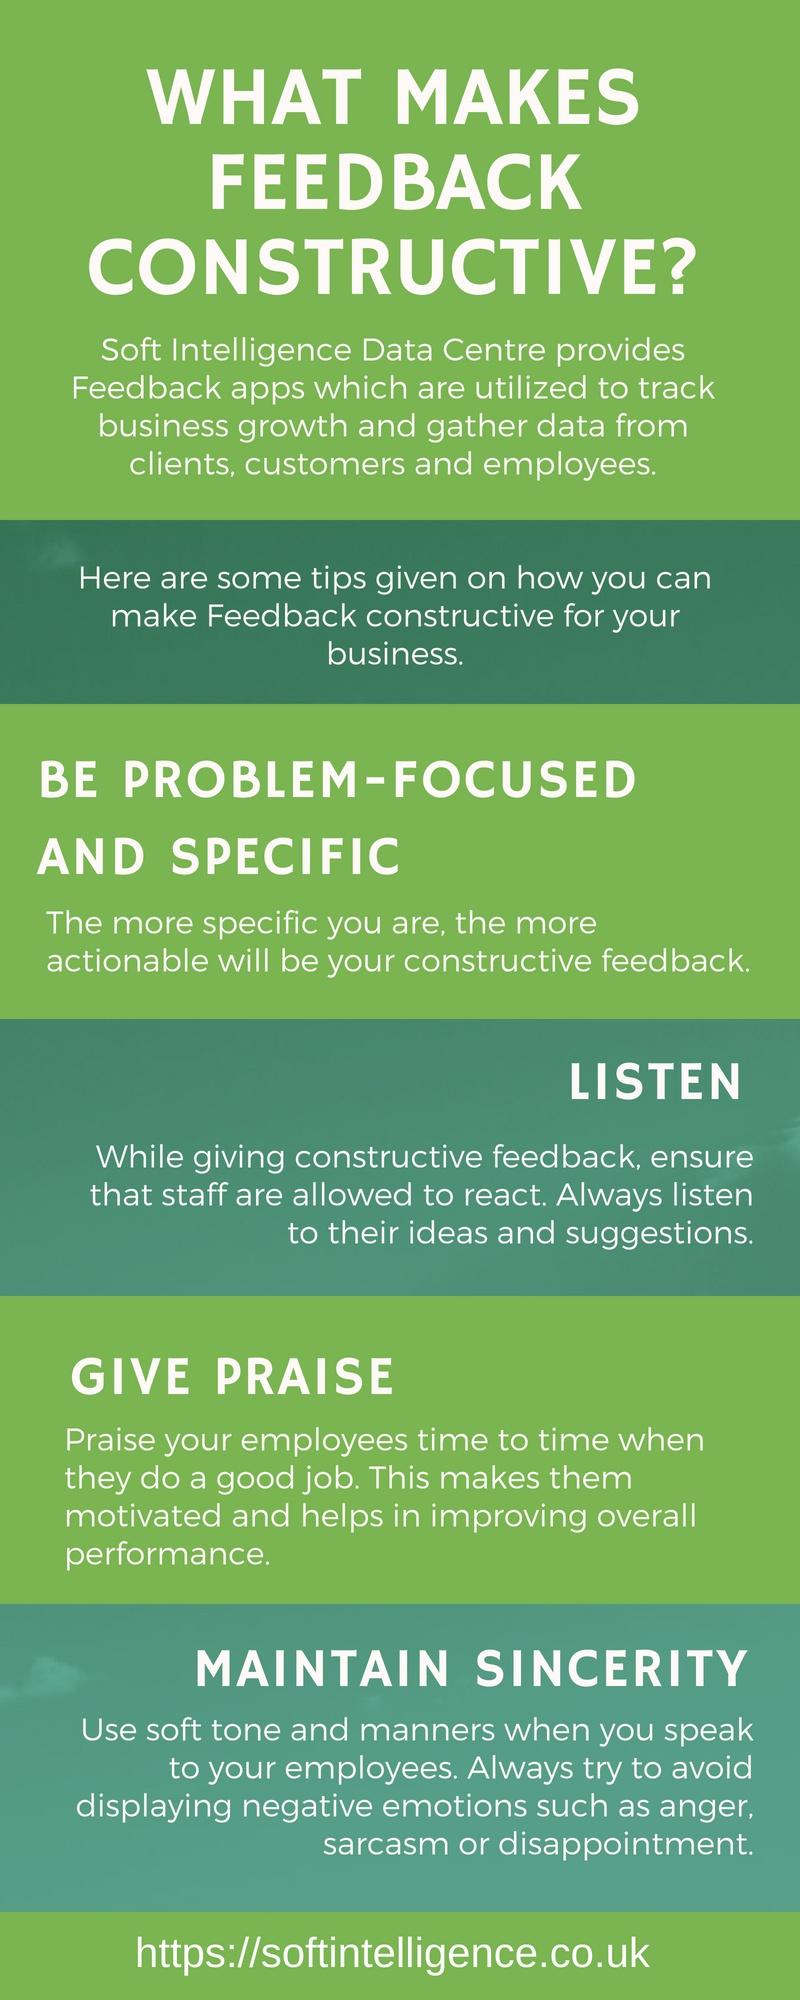 Understanding What My Staff Think, Staff Feedback Infographic